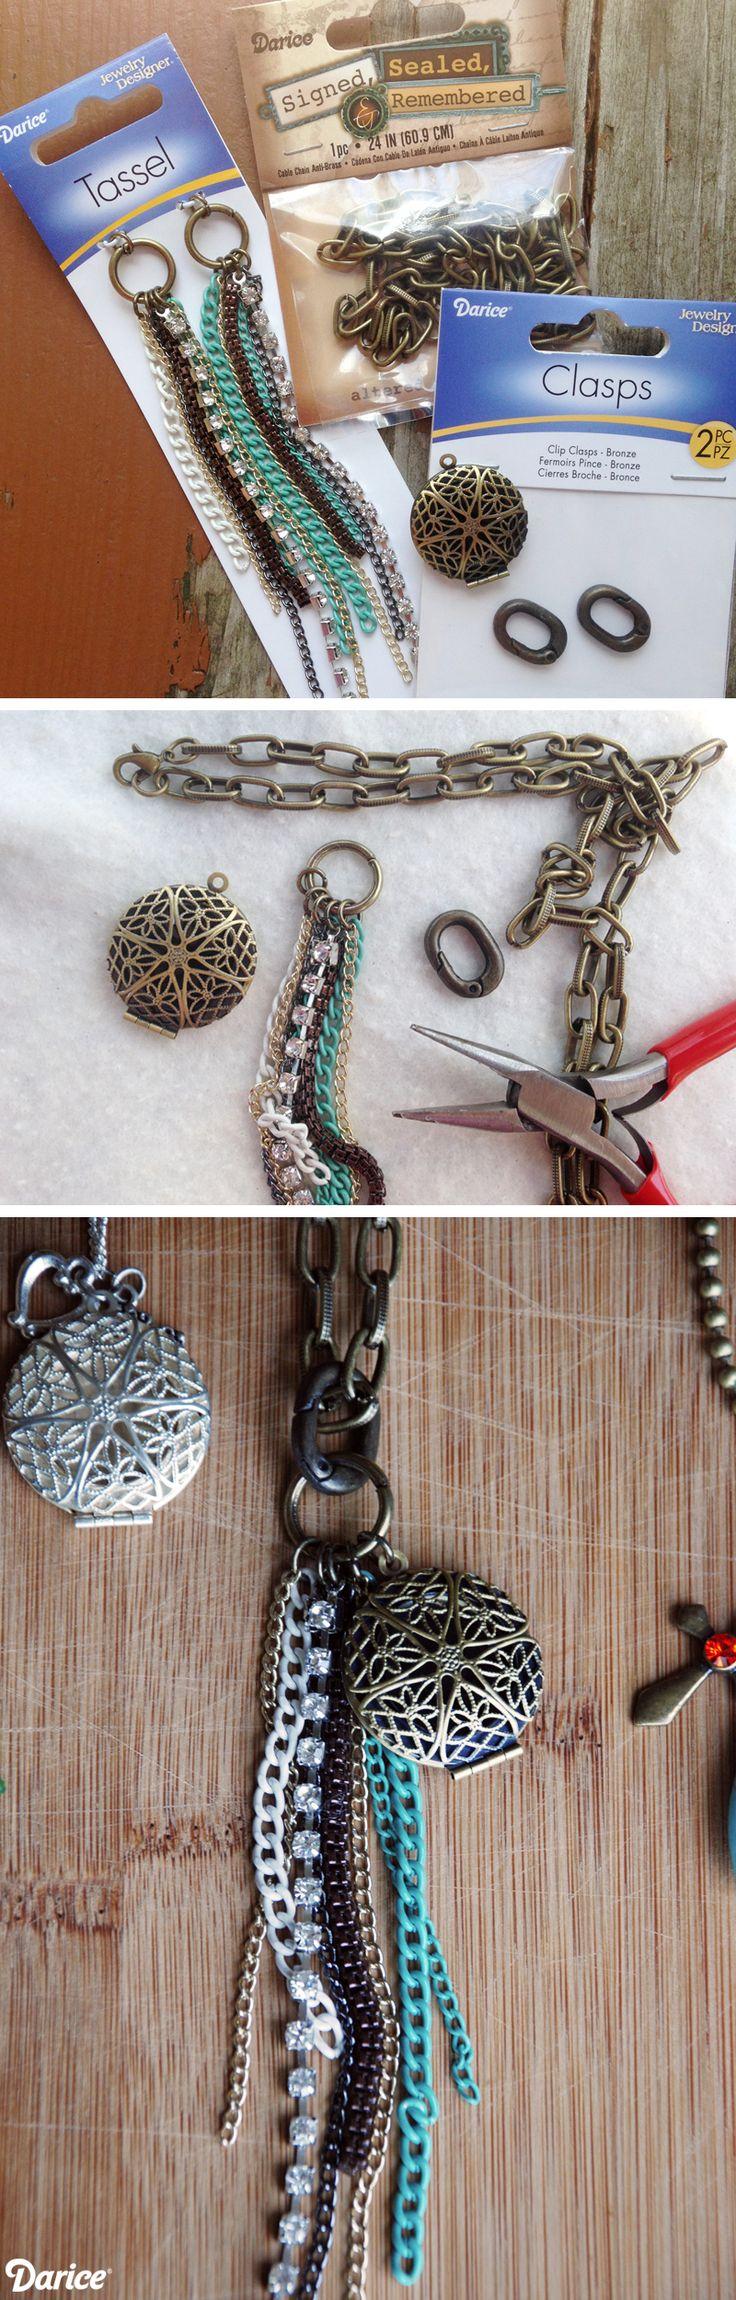 DIY Essential Oil Diffuser Necklaces Find essential oils here: http://www.mydoterra.com/vogele/